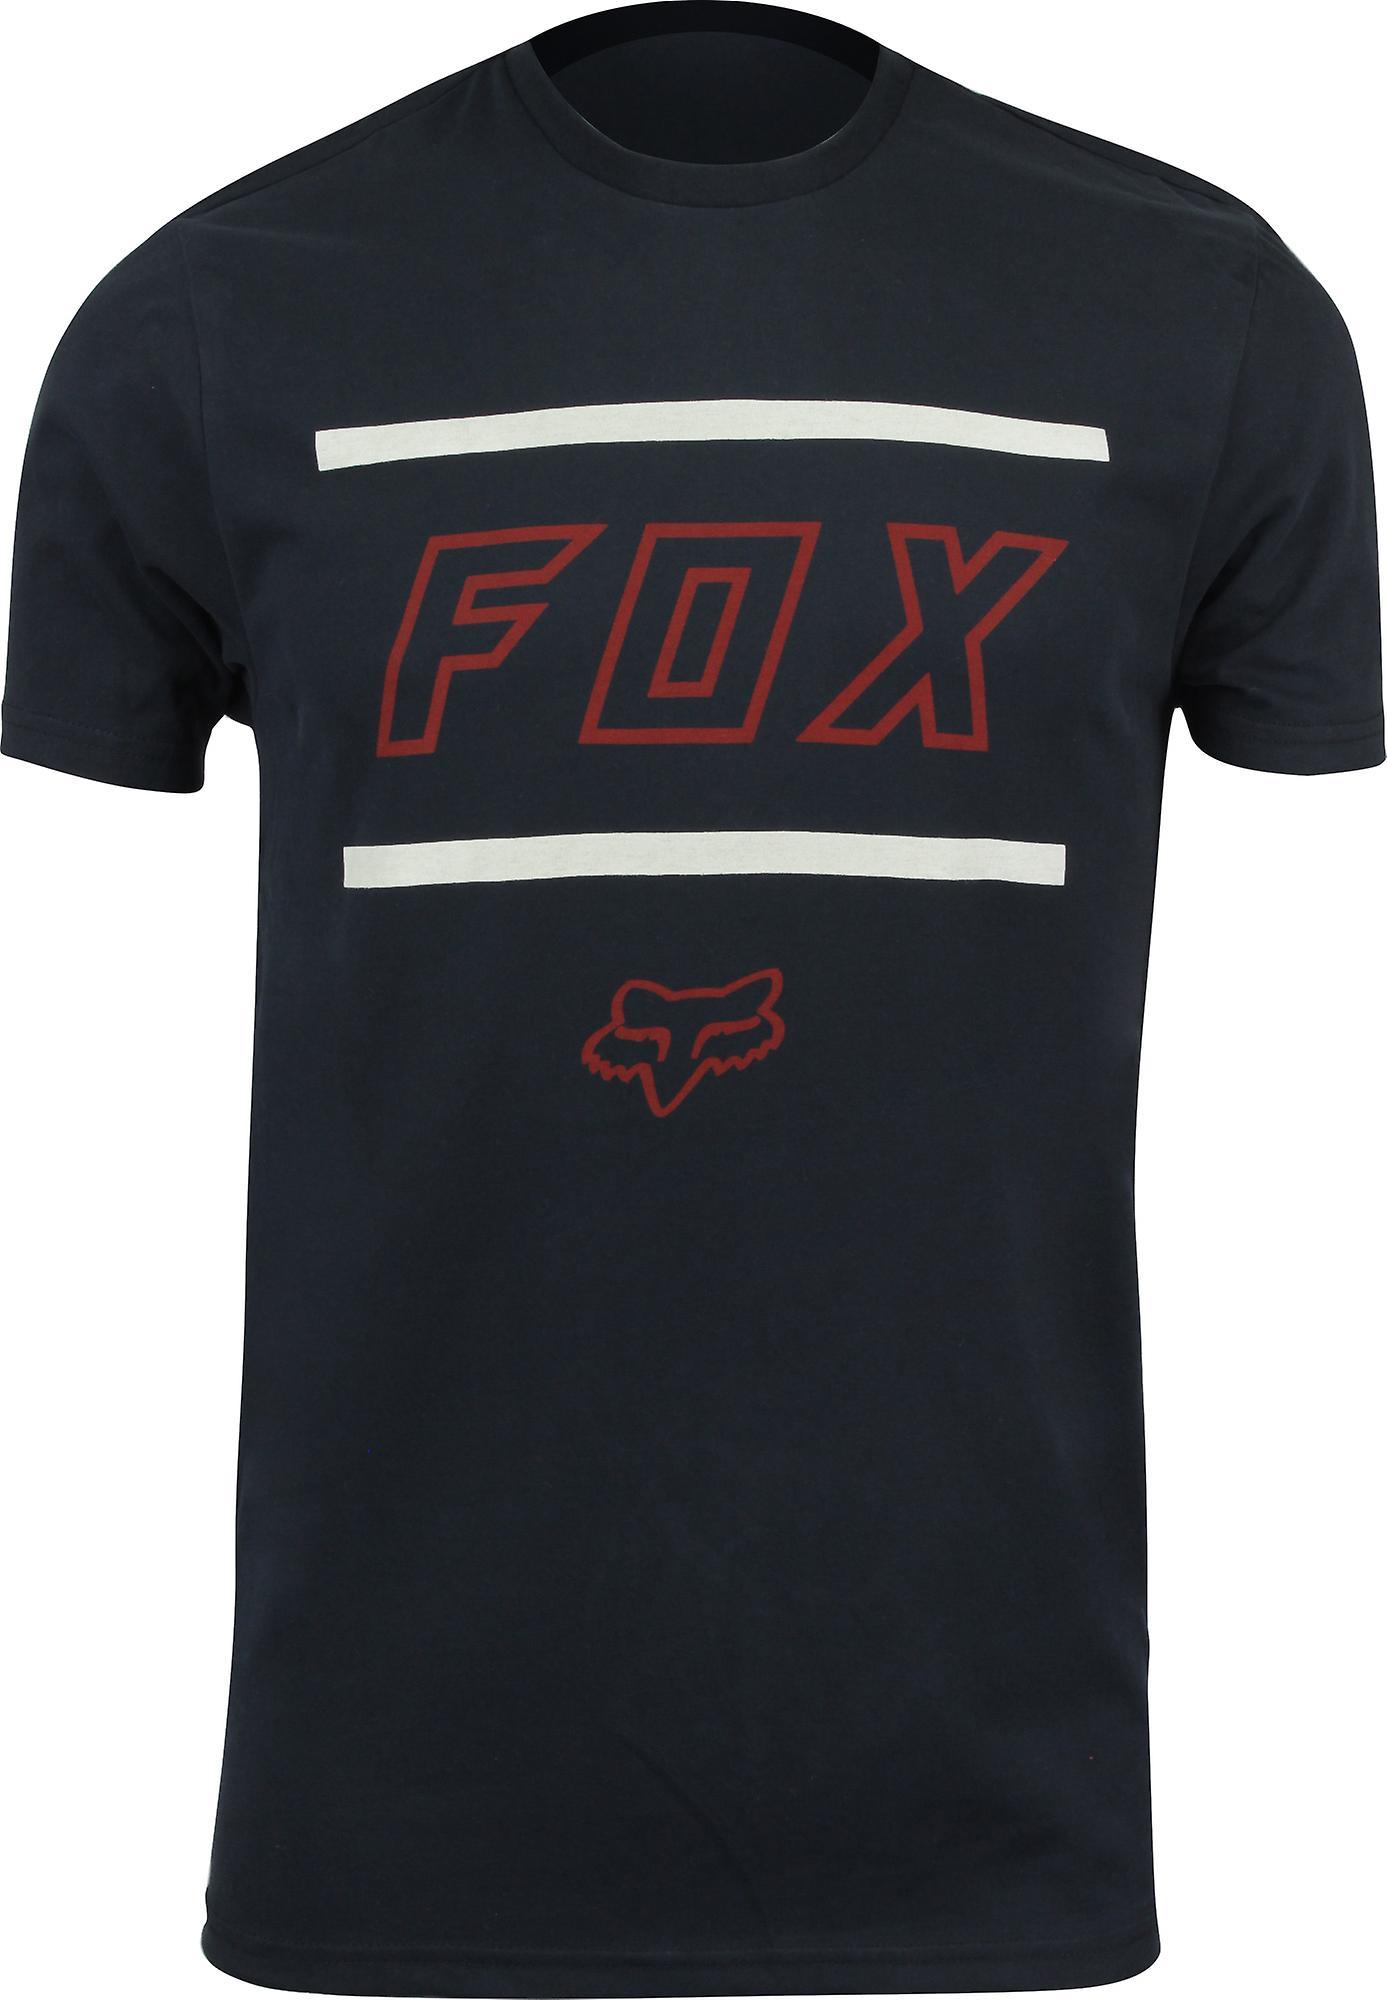 FOX RACING MENS BLACK LOGO T SHIRT